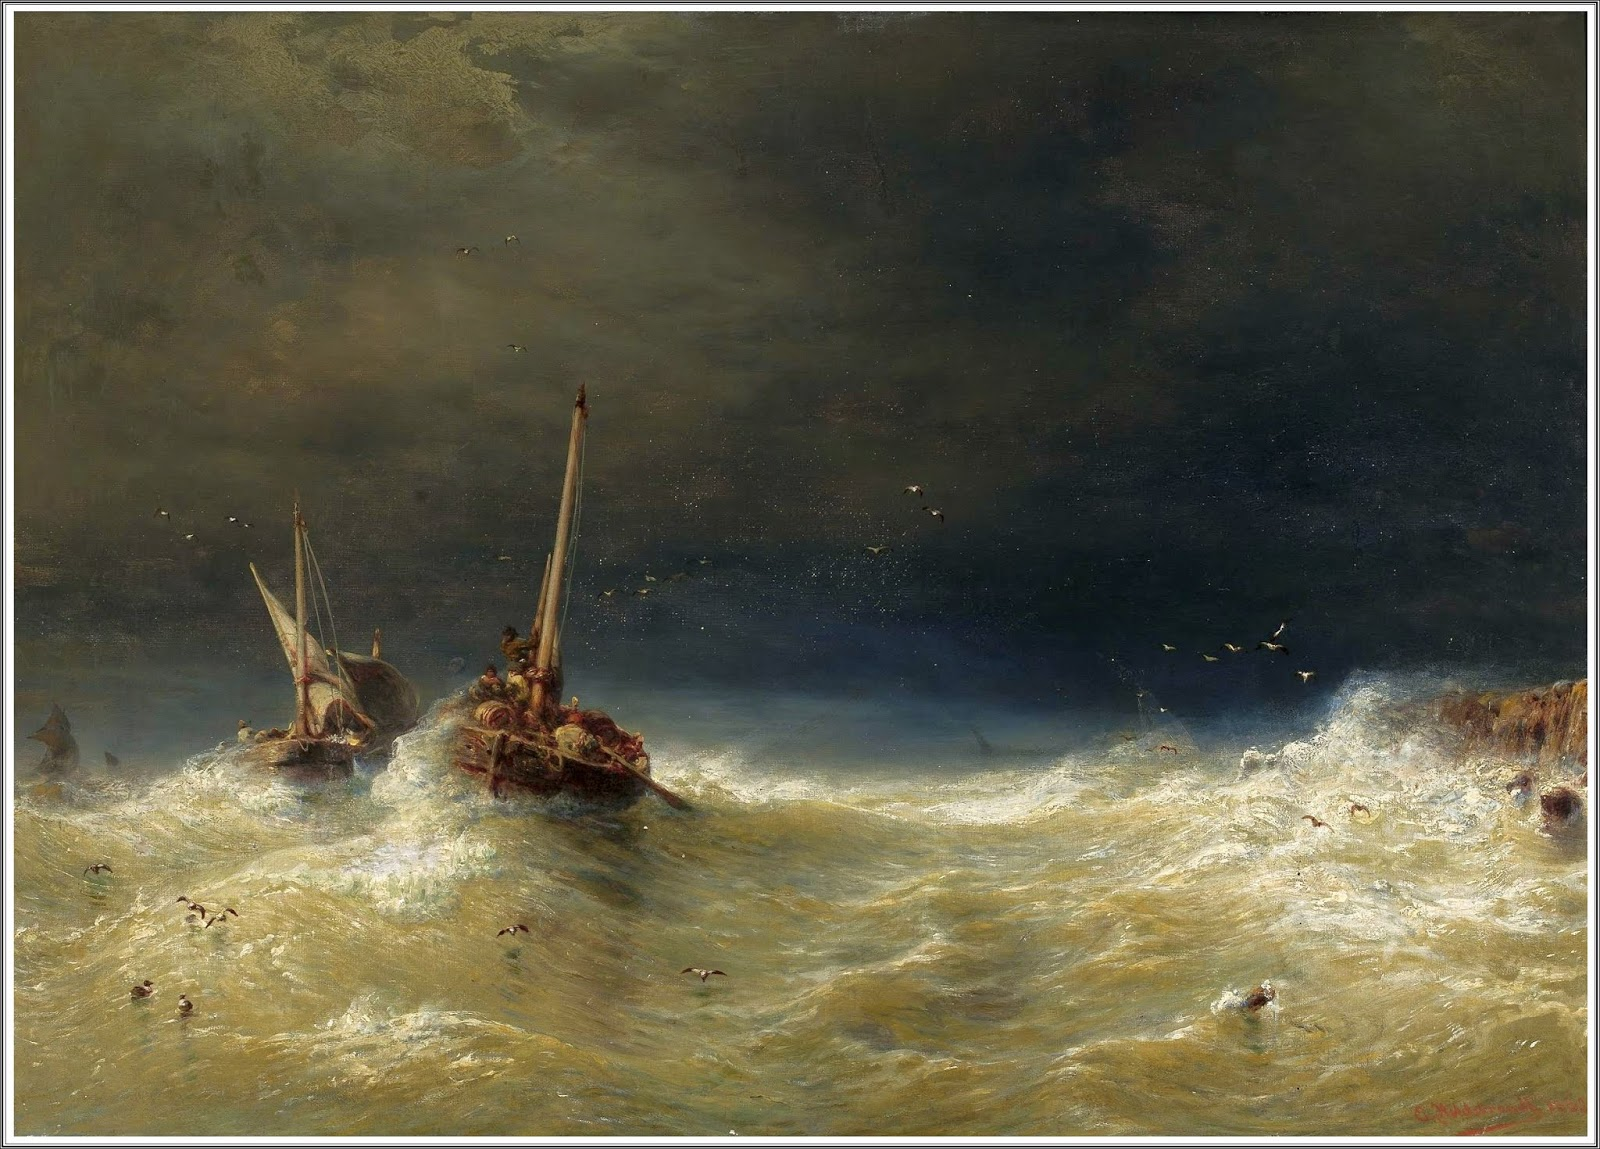 Mary Chaplin Artiste Peintre le prince lointain: eduard hildebrandt (1818-1869), tempête